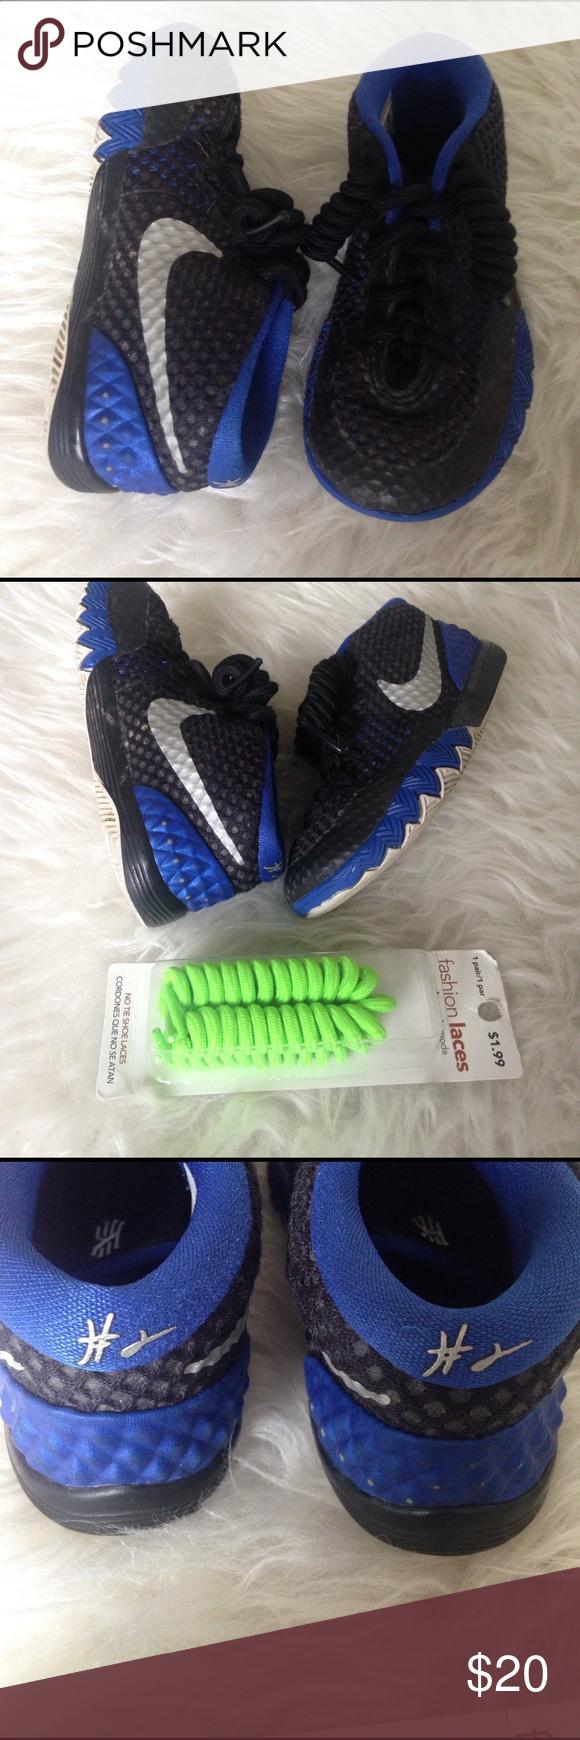 Toddler Boys basketball Kyrie Irving Nike sneakers Nike Kyrie Irving toddler  boys shoes. Size 9c